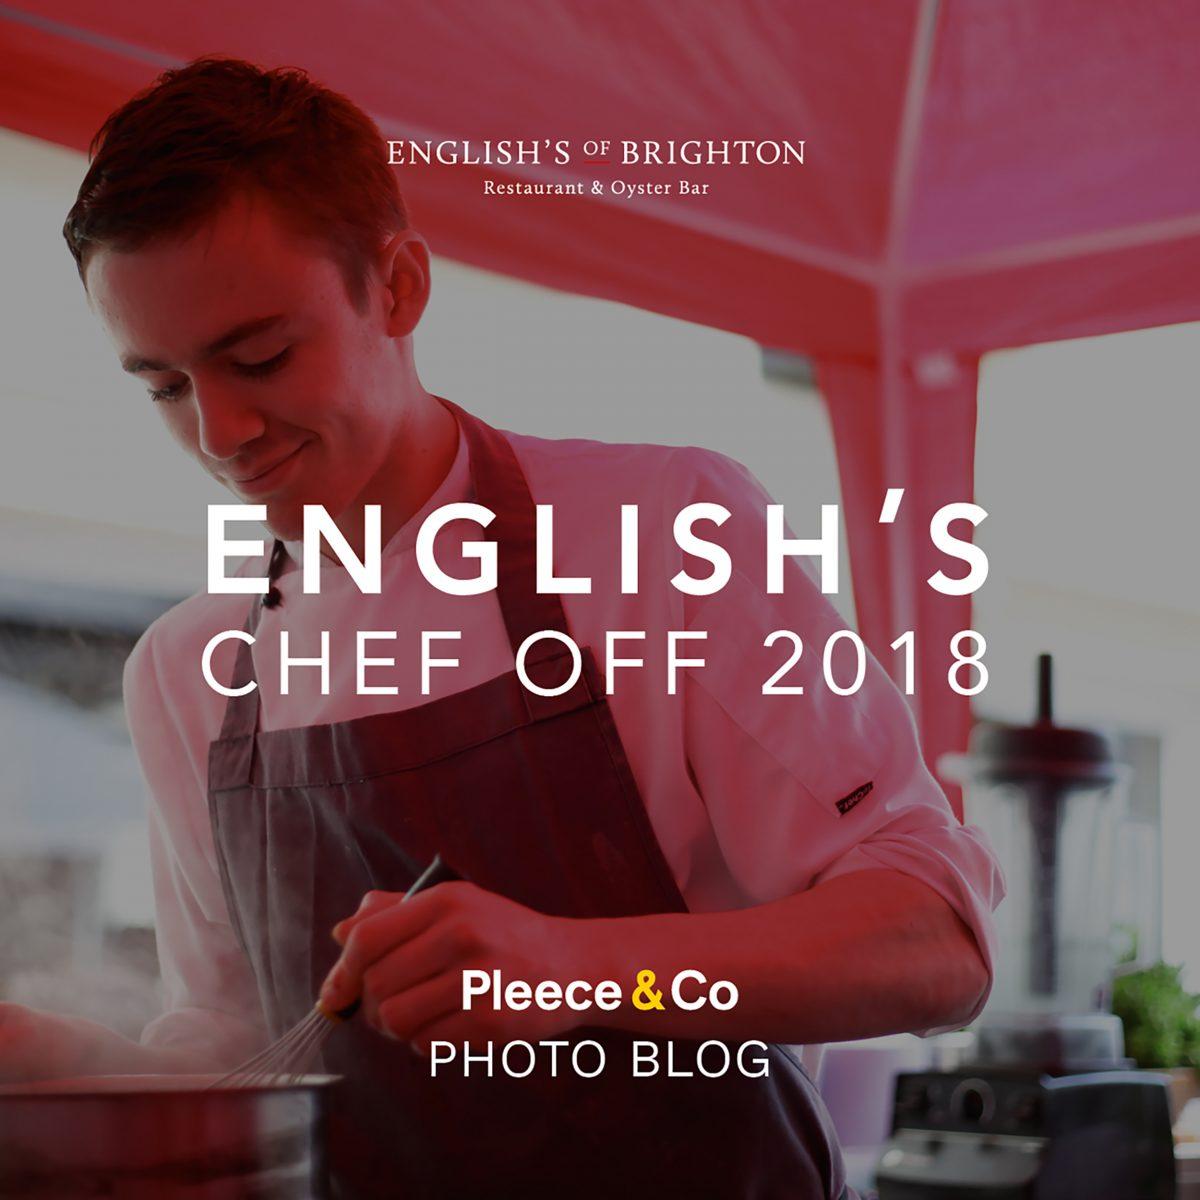 English's Chef Off 2018  Pleece & Co Photo Blog